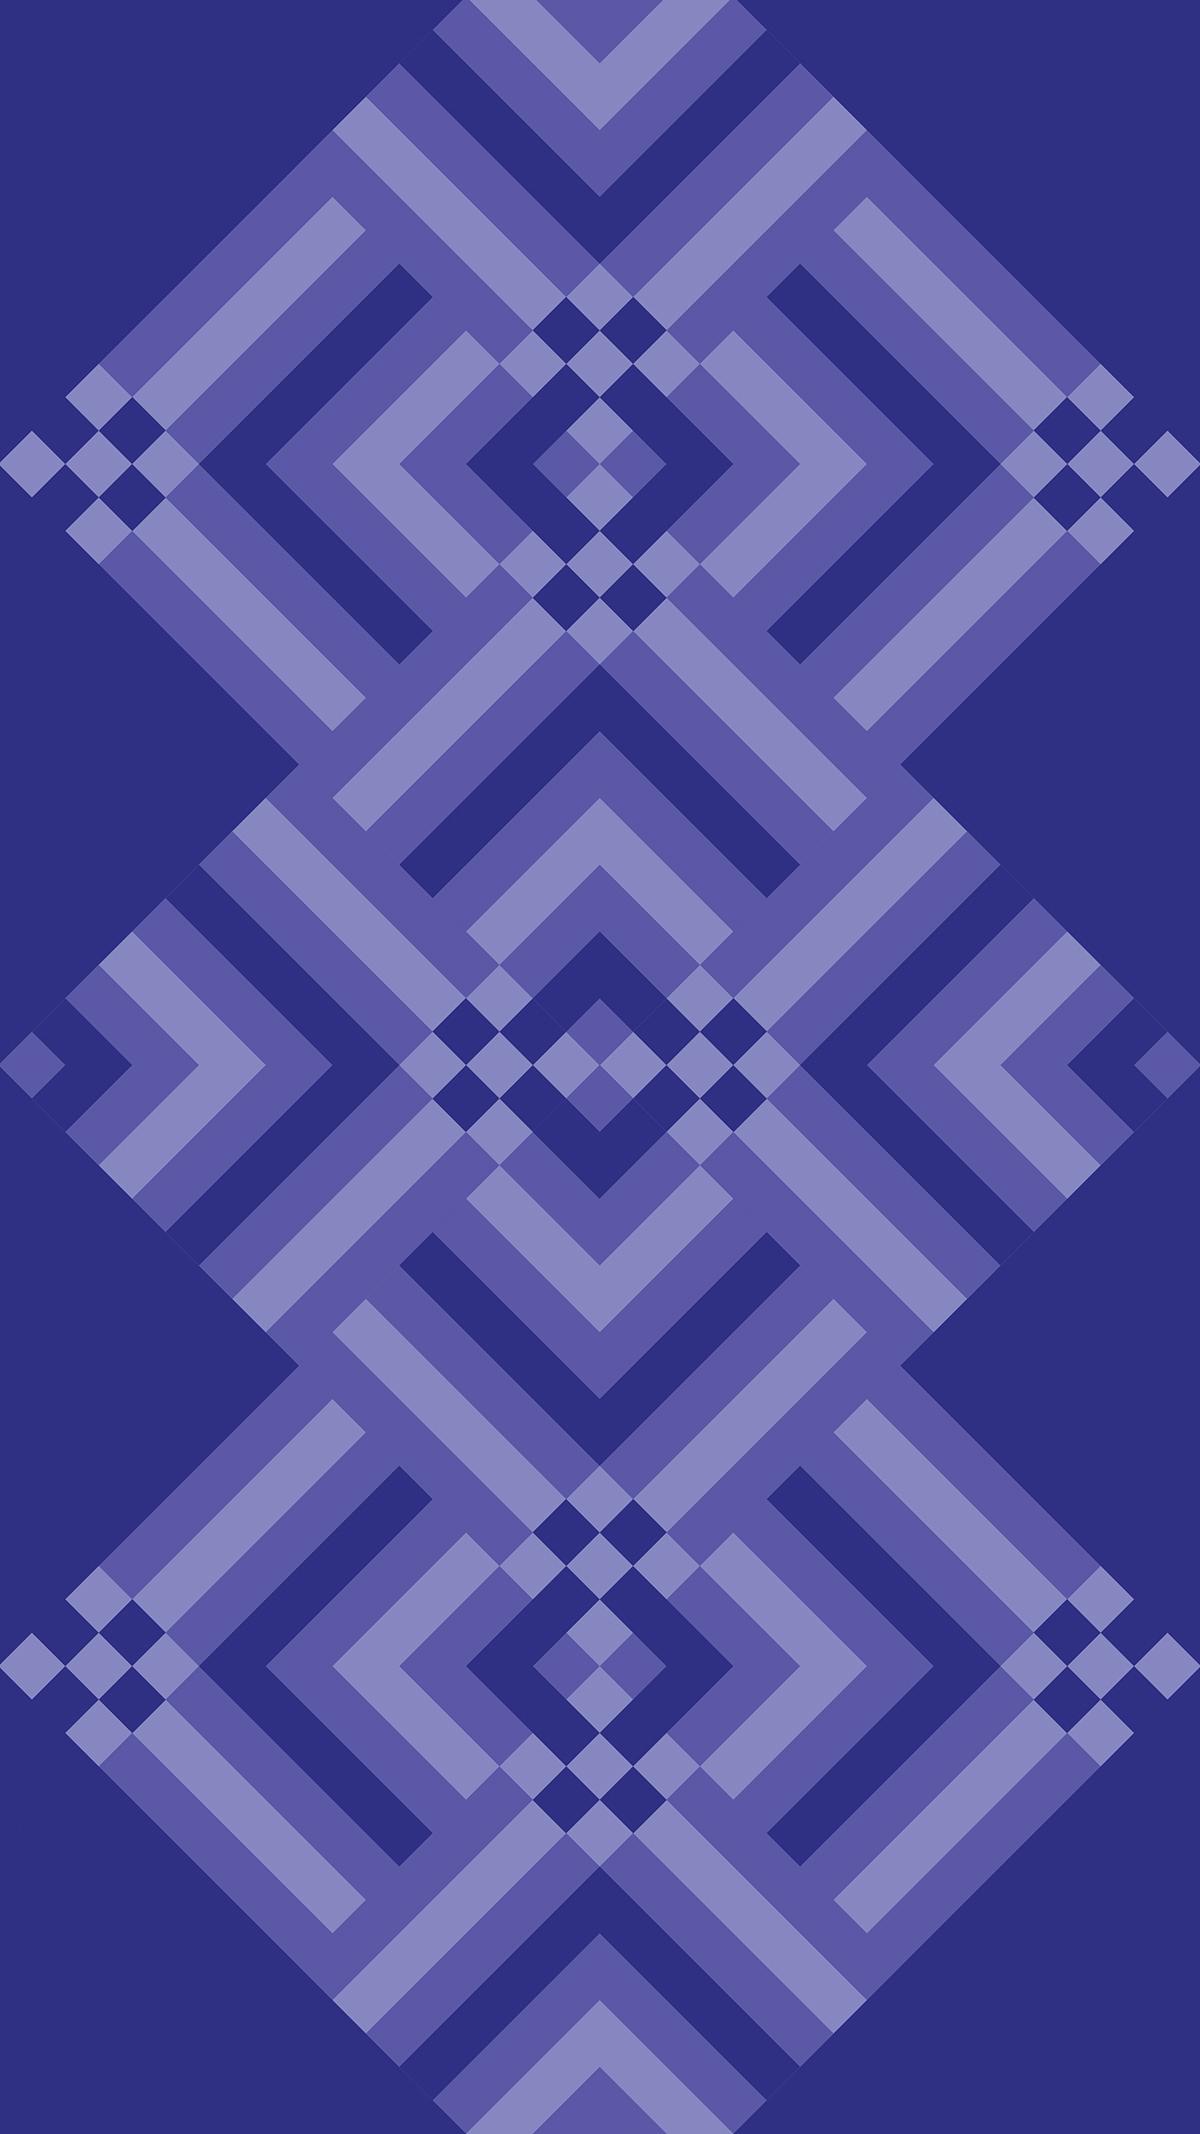 pattern explore 04